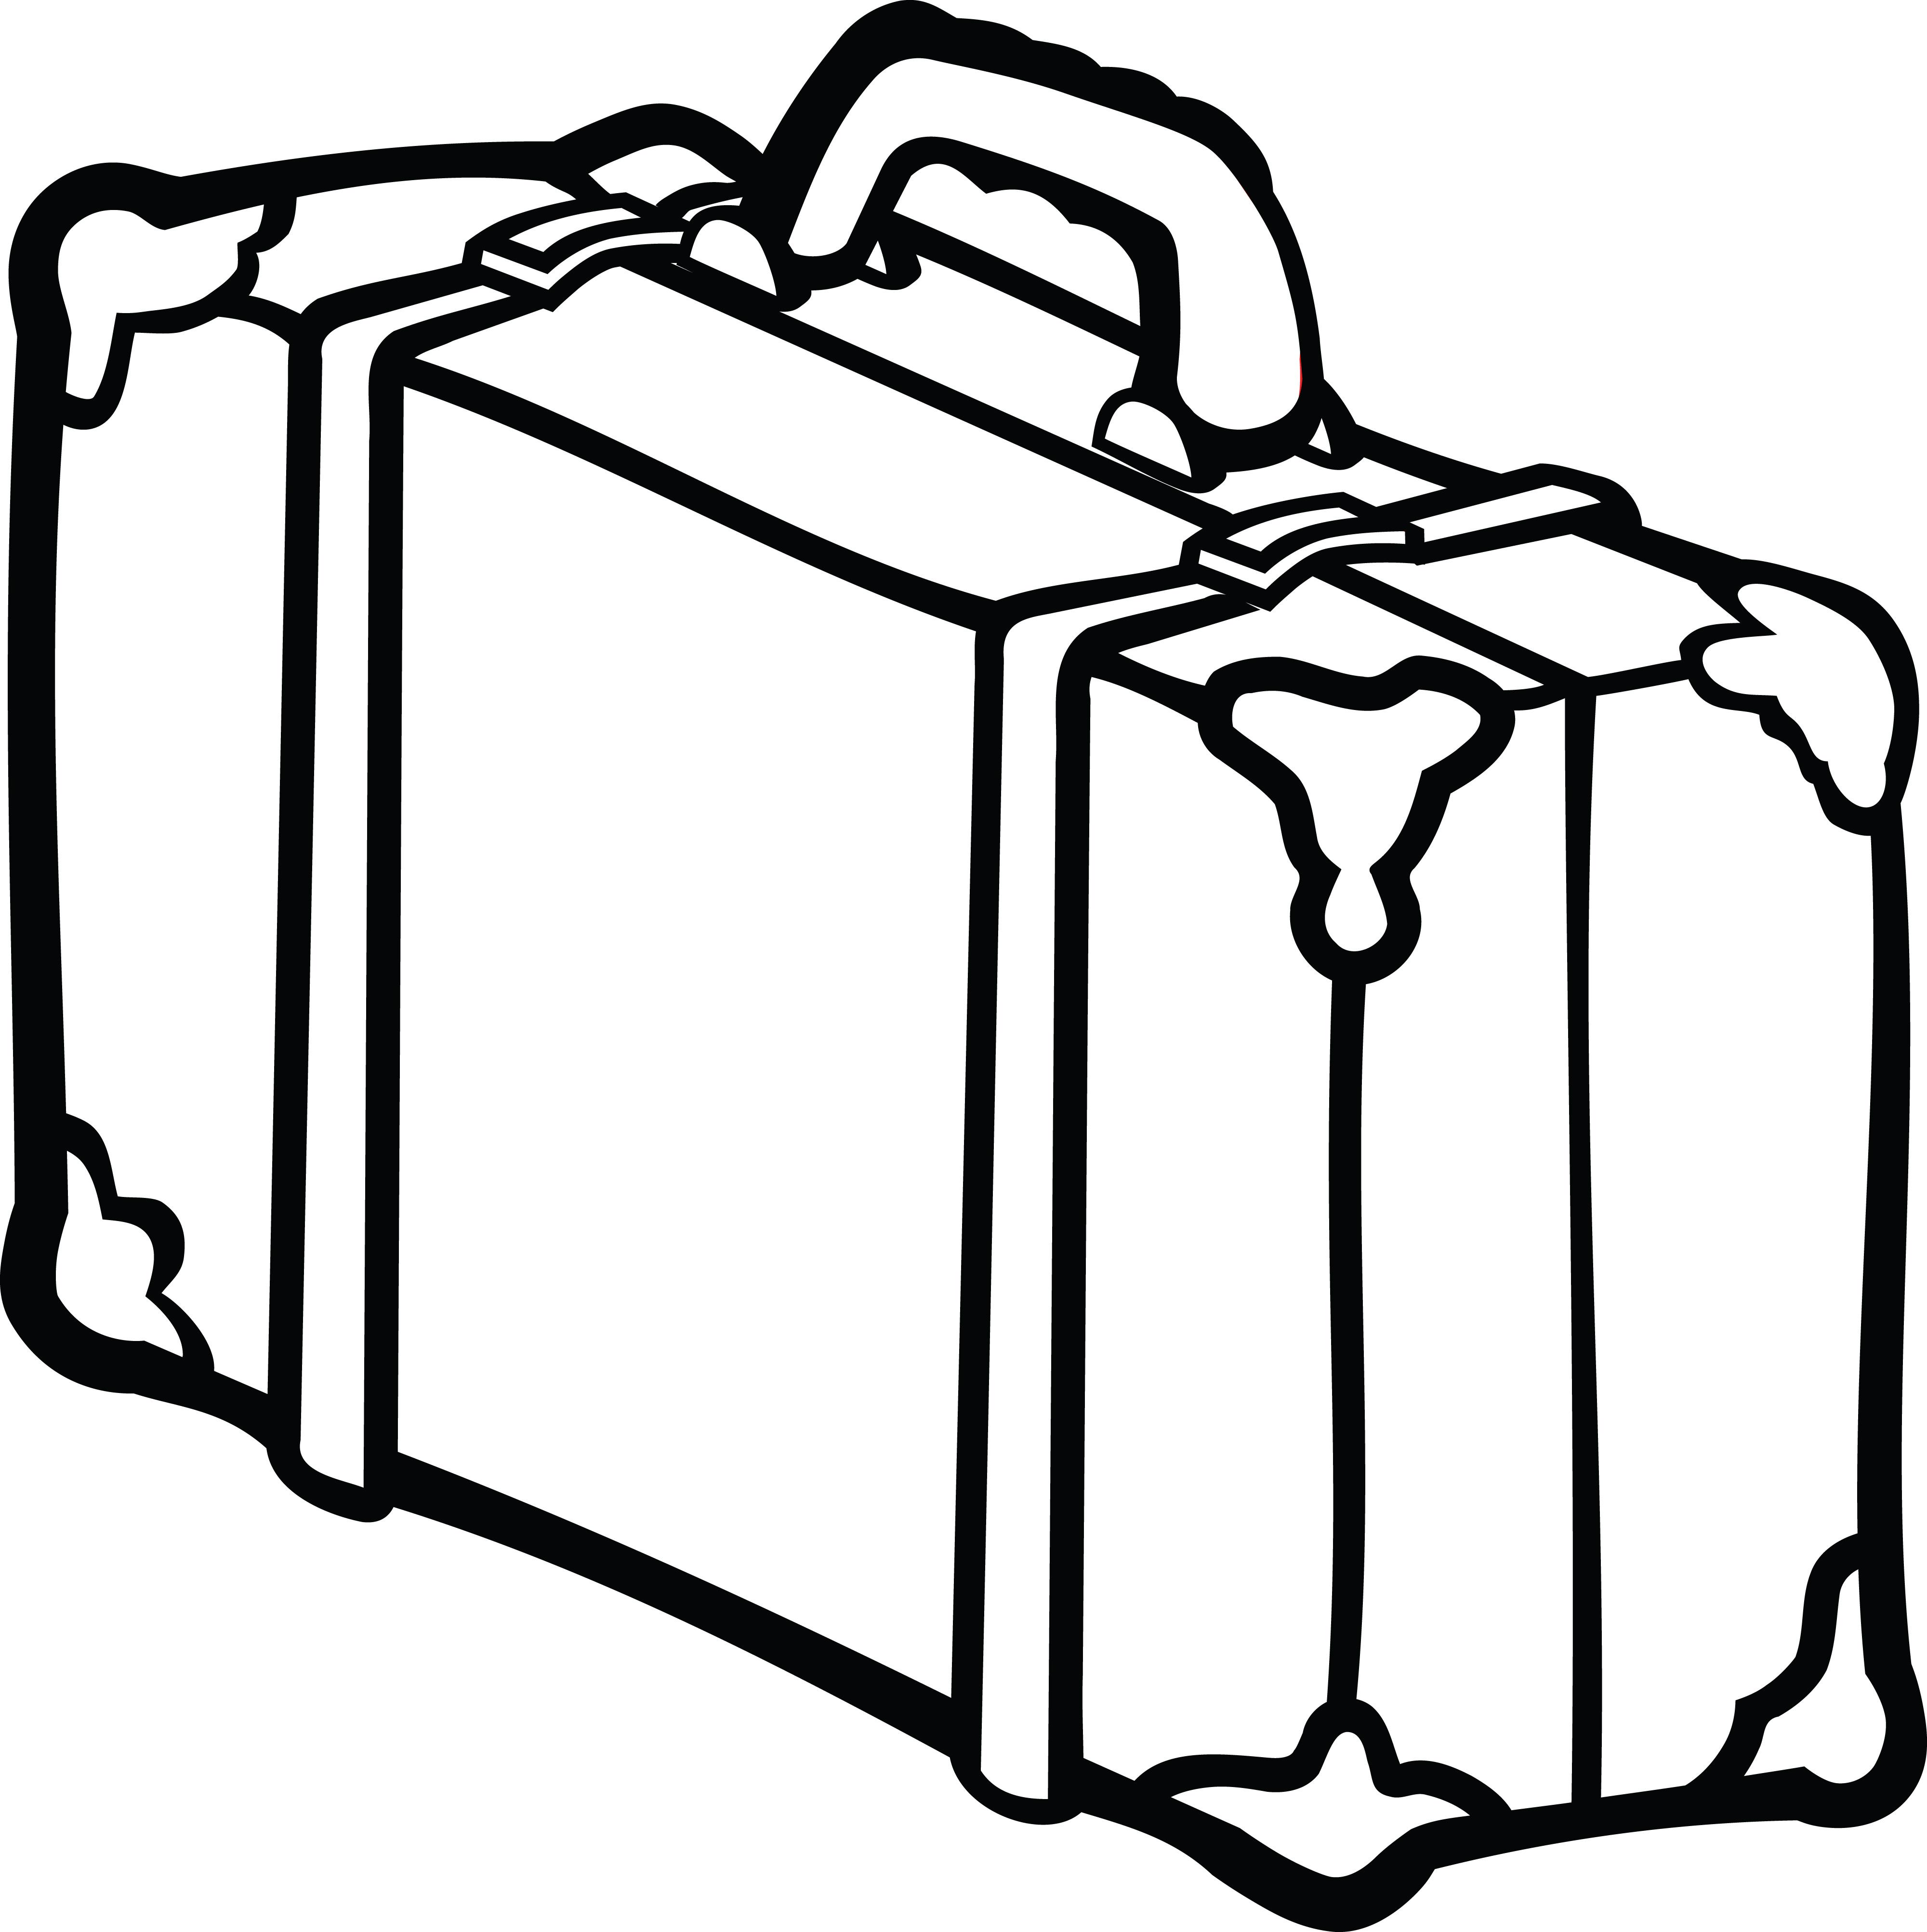 Suitcase Clipart-Clipartlook.com-4000-Suitcase Clipart-Clipartlook.com-4000-0